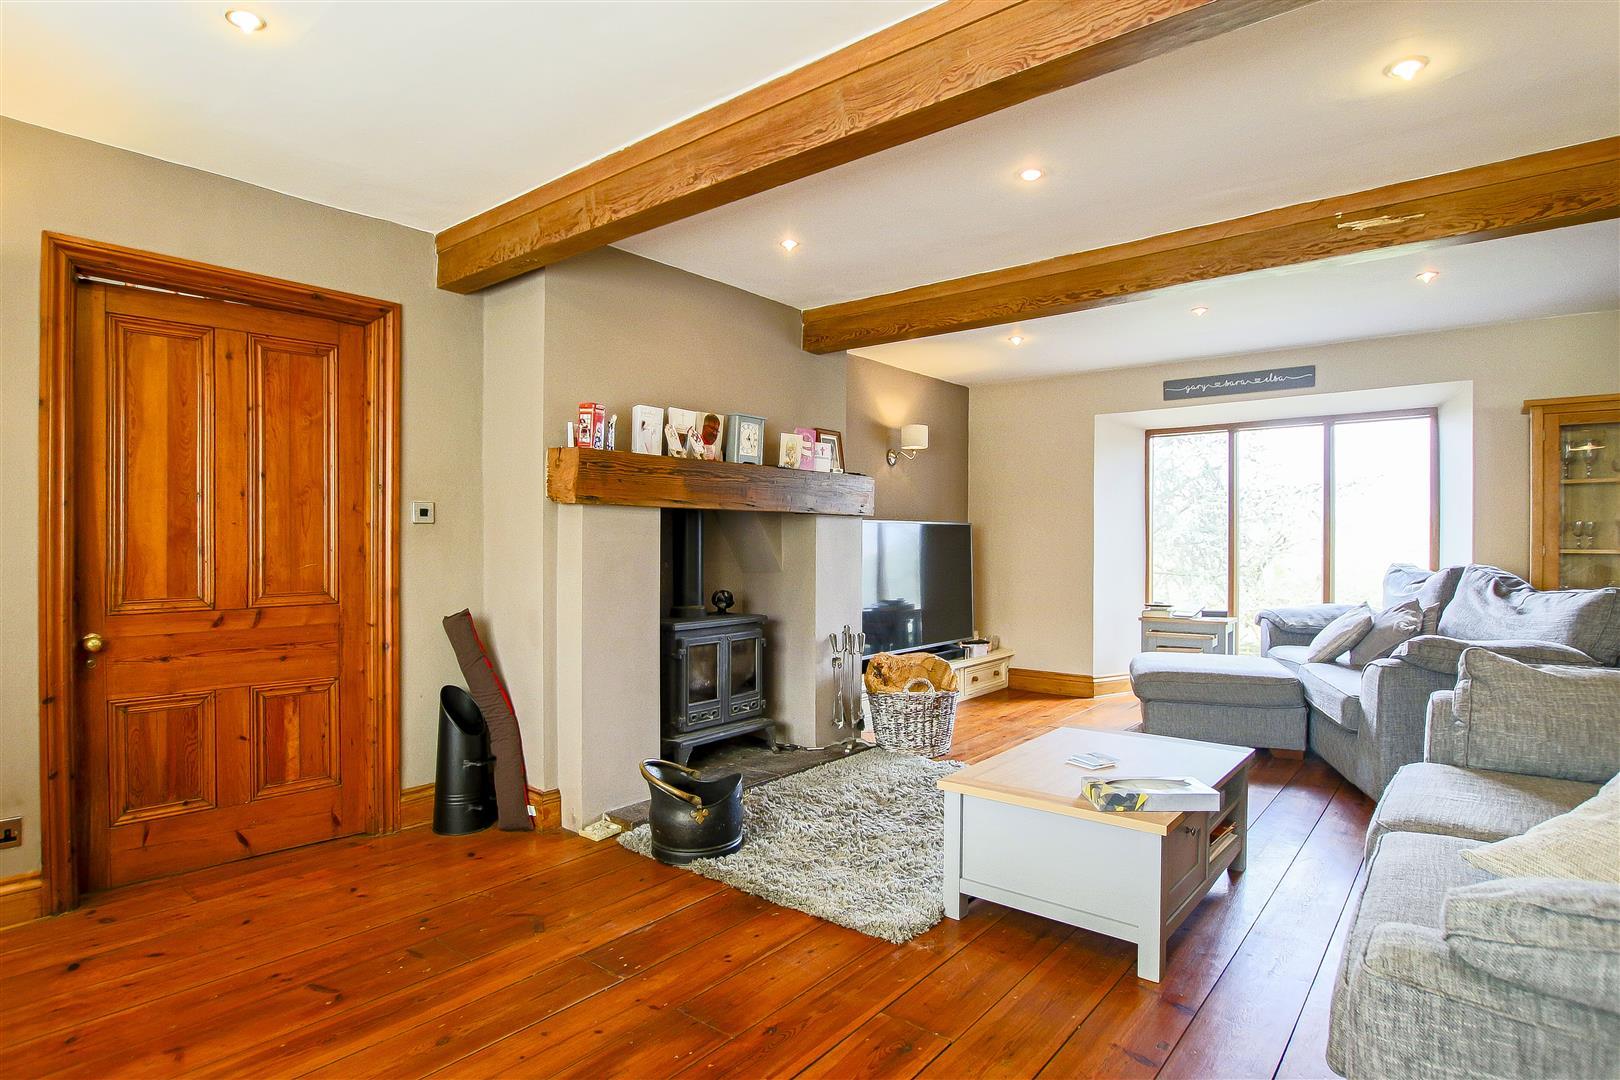 5 Bedroom Barn Conversion For Sale - 7.jpg